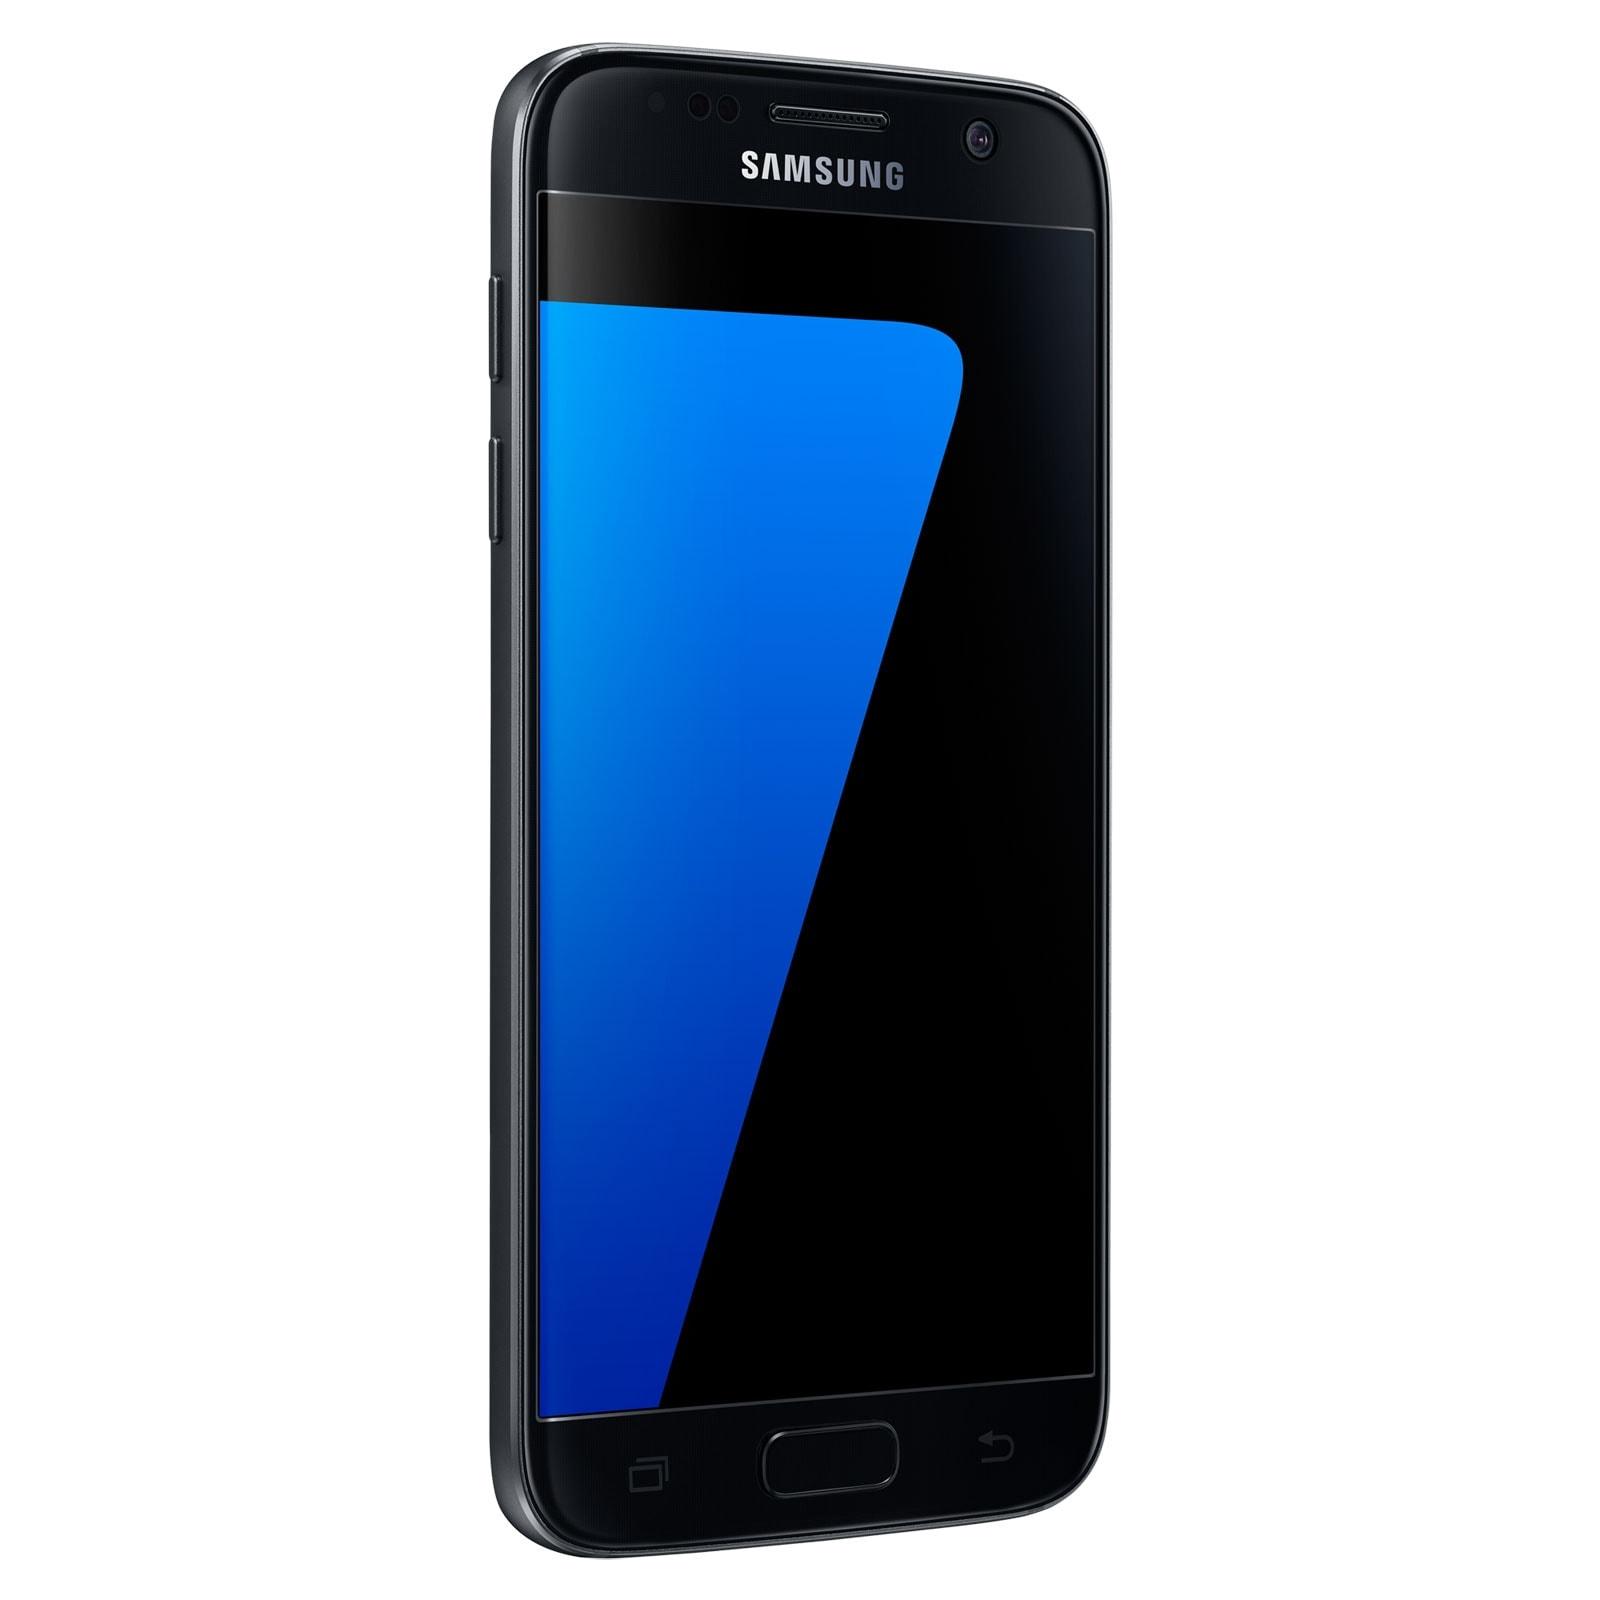 Samsung Galaxy S7 32Go G930F Black - Téléphonie Samsung - 0